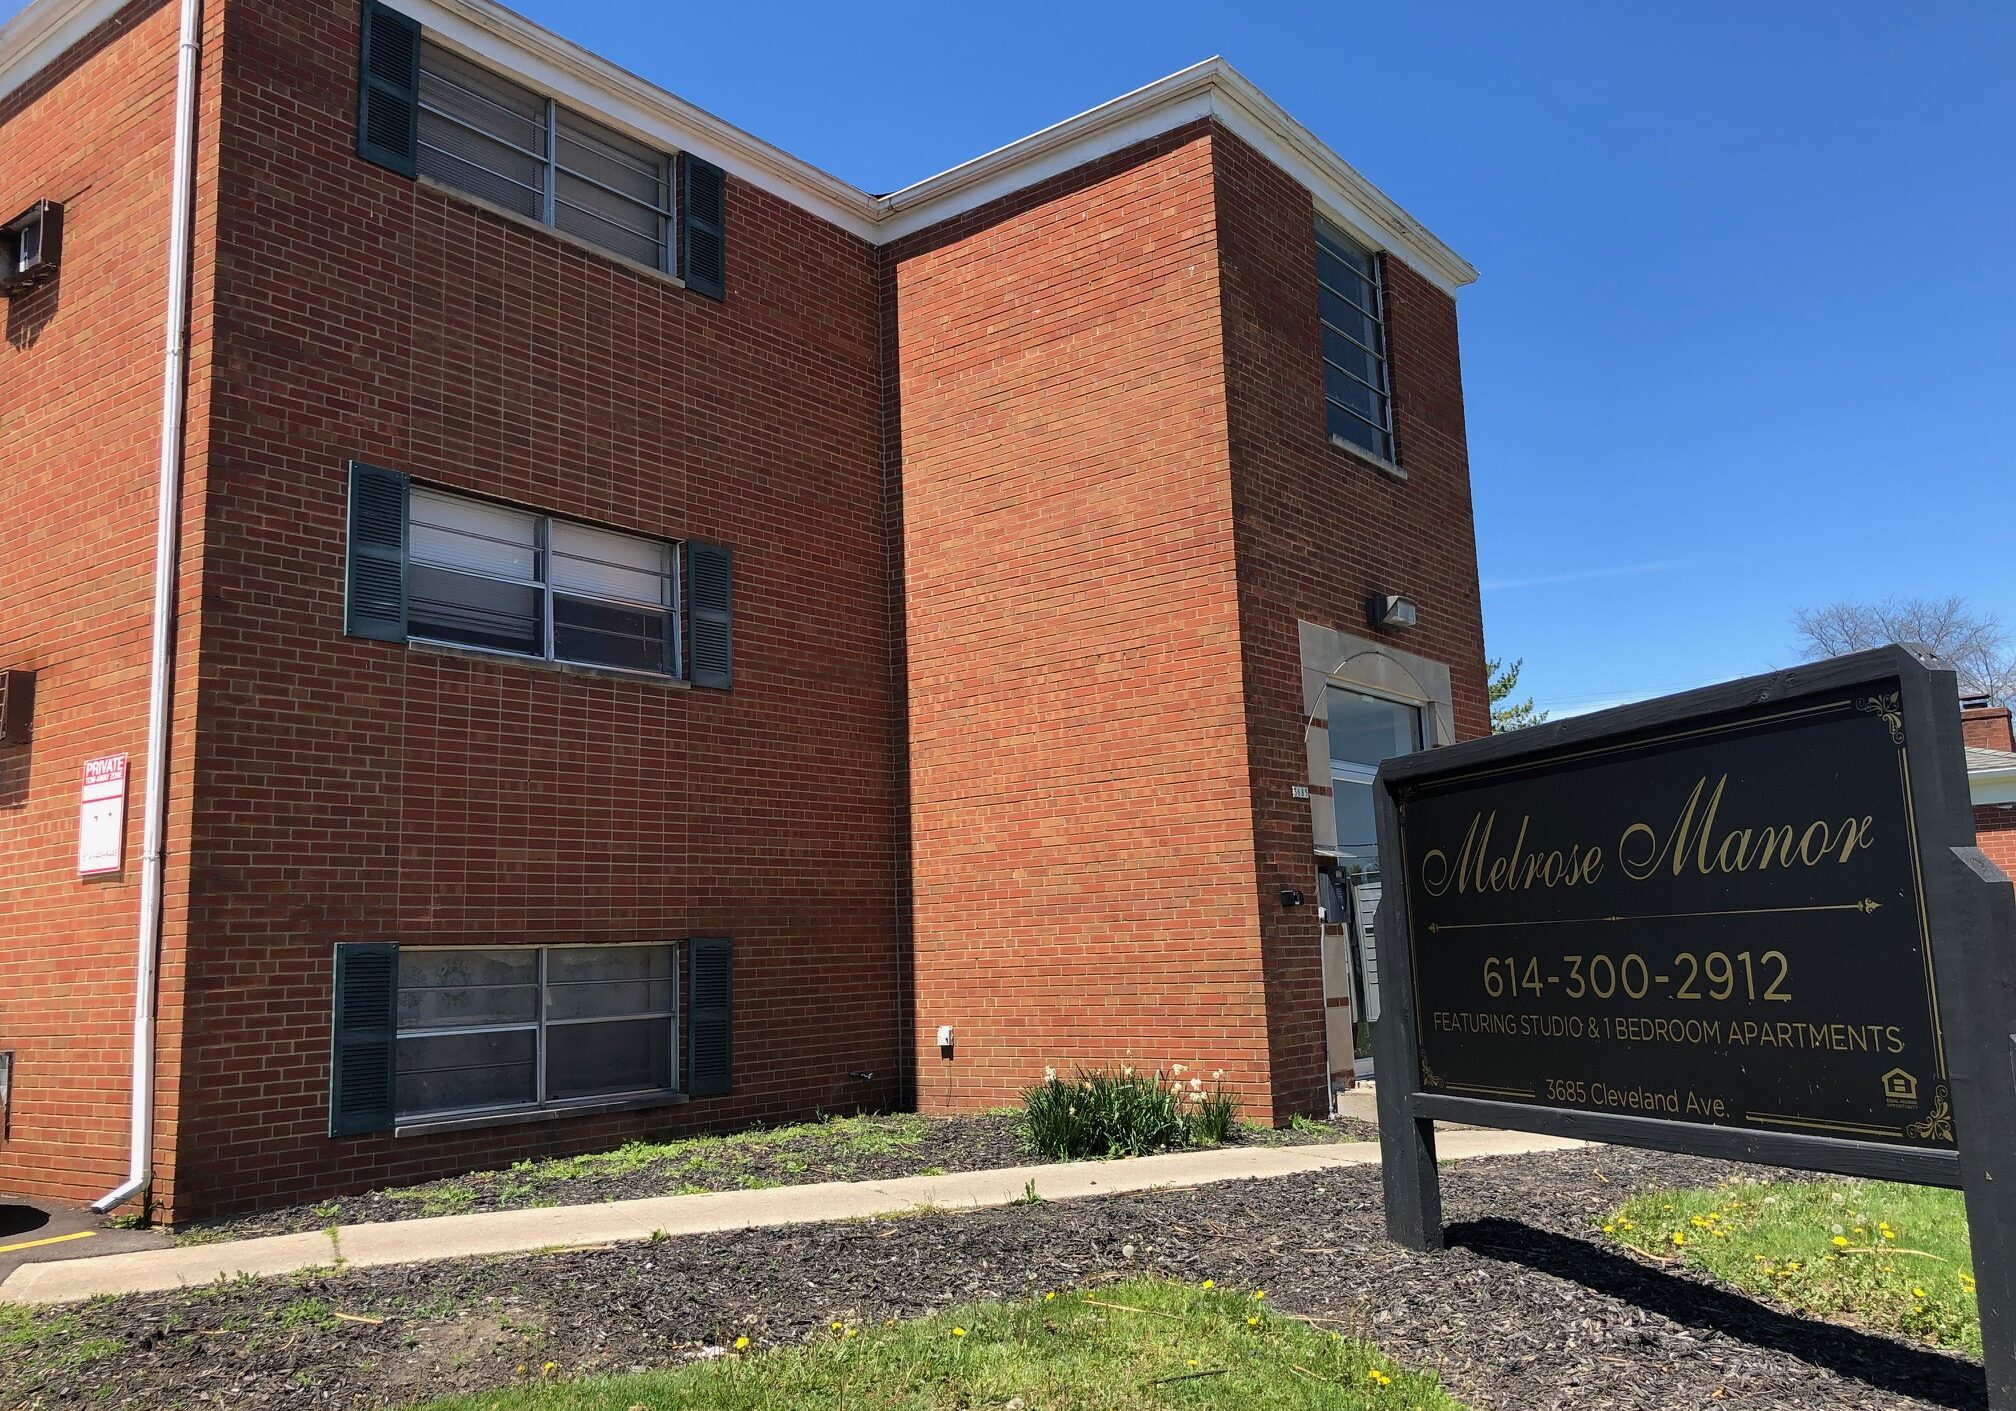 Melrose Manor Workforce Housing Investment Property Columbus, Ohio